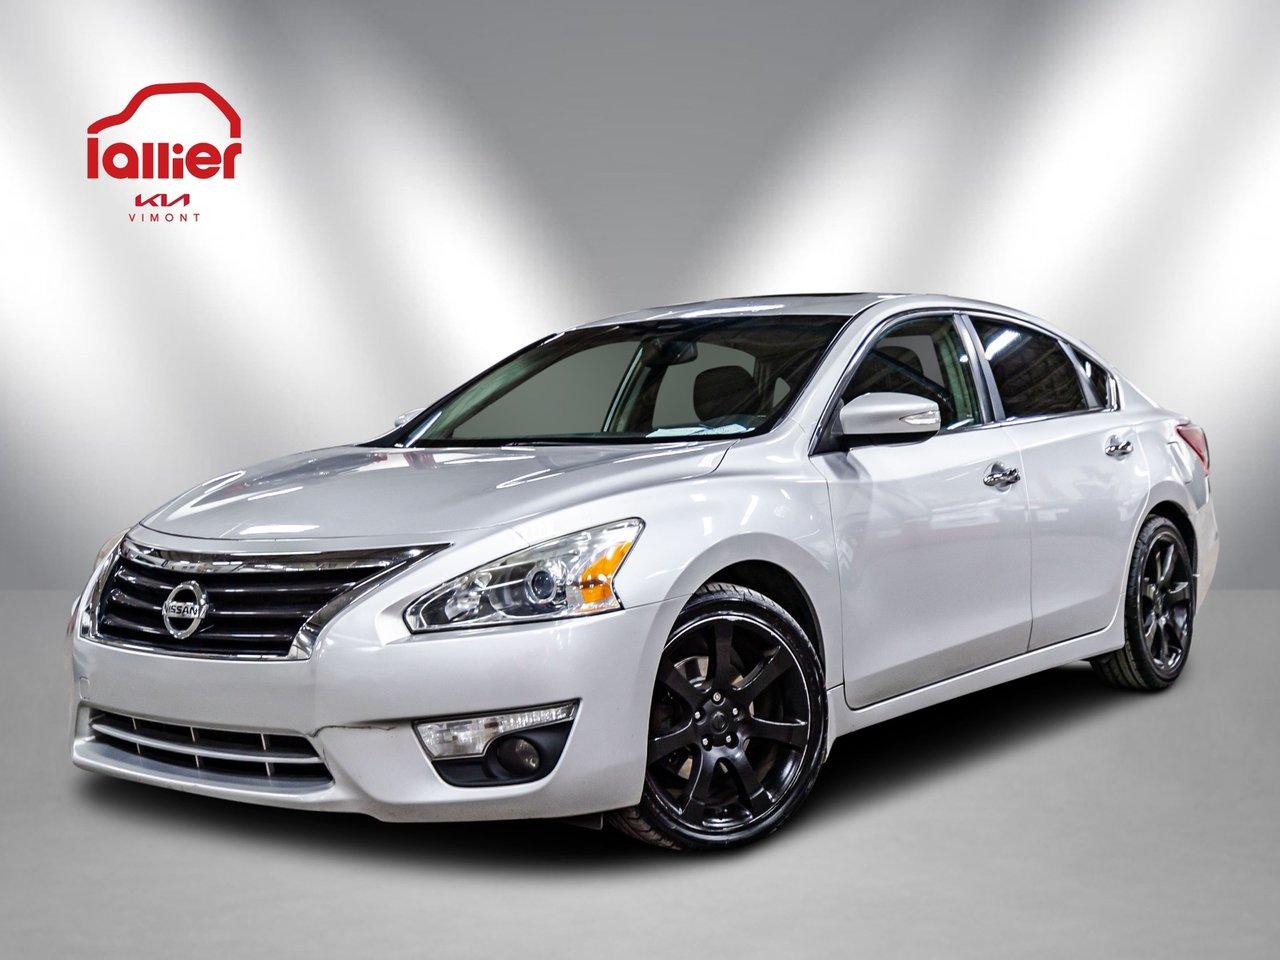 2013 Nissan Altima 3.5 SV **TOIT OUVRANT, CUIR, CAMÉRA DE RECUL*